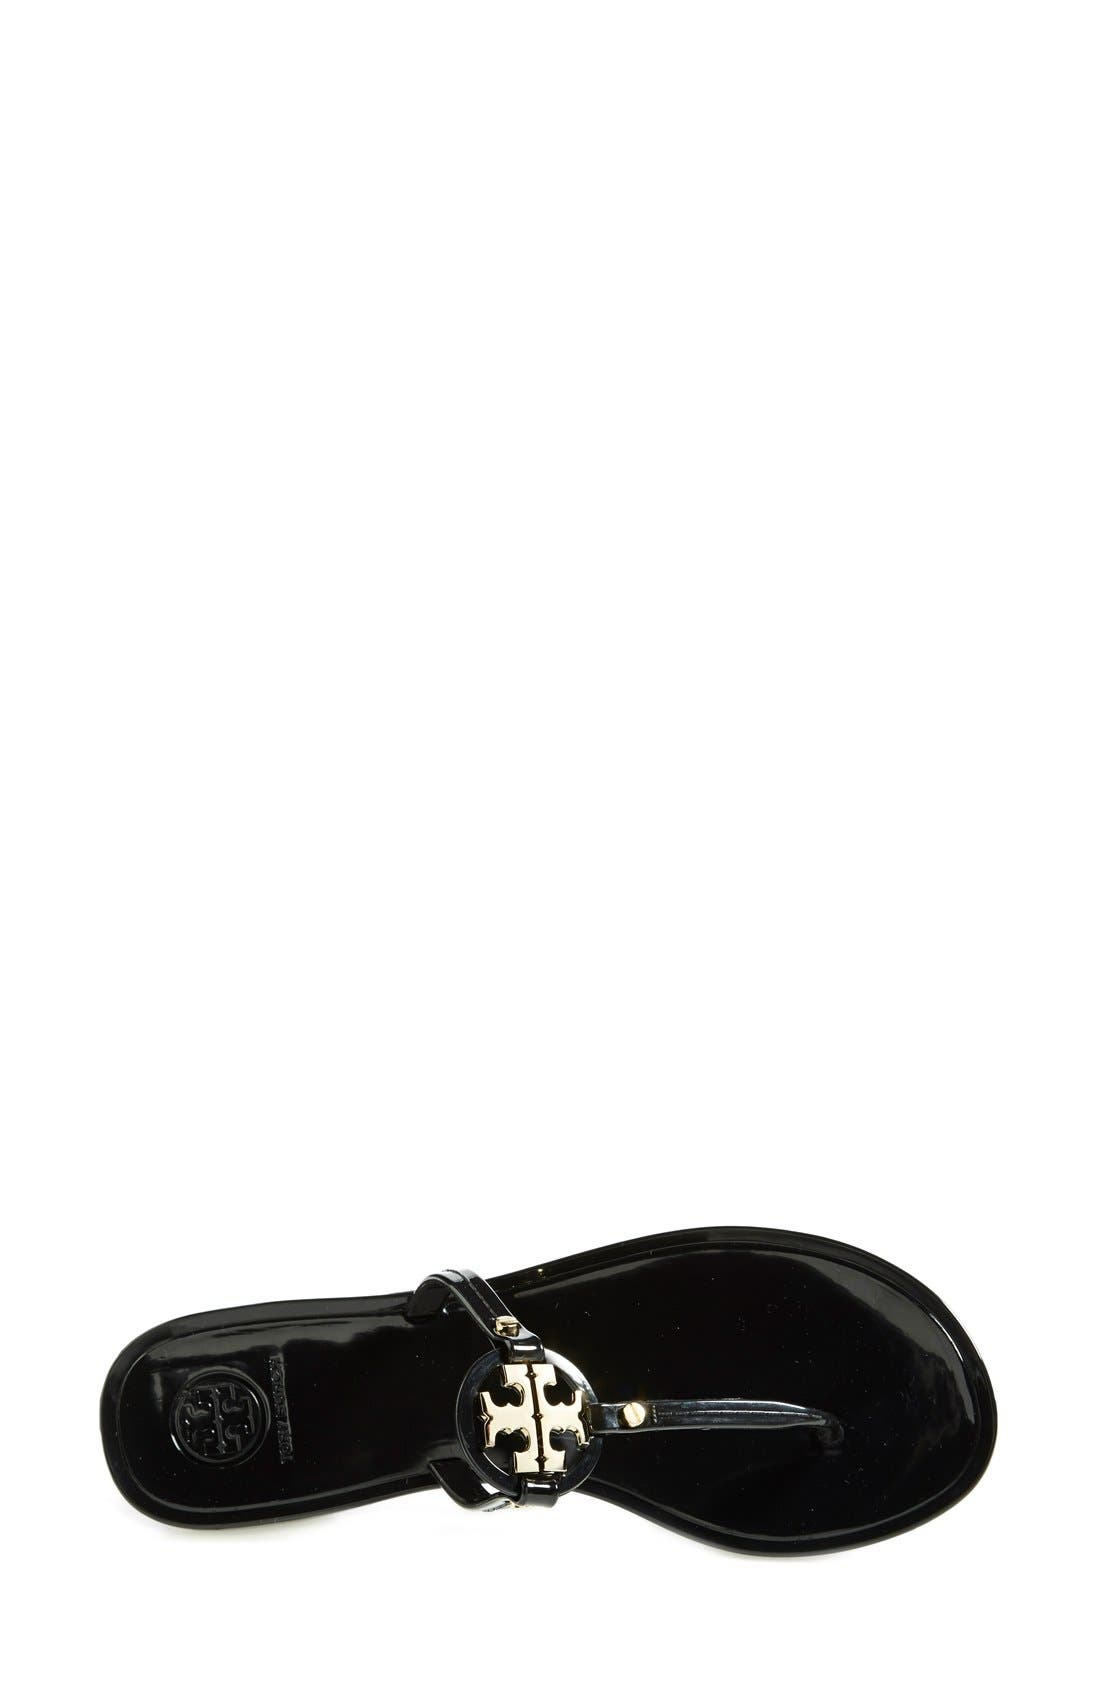 Alternate Image 3  - Tory Burch 'Mini Miller' Flat Sandal (Women)